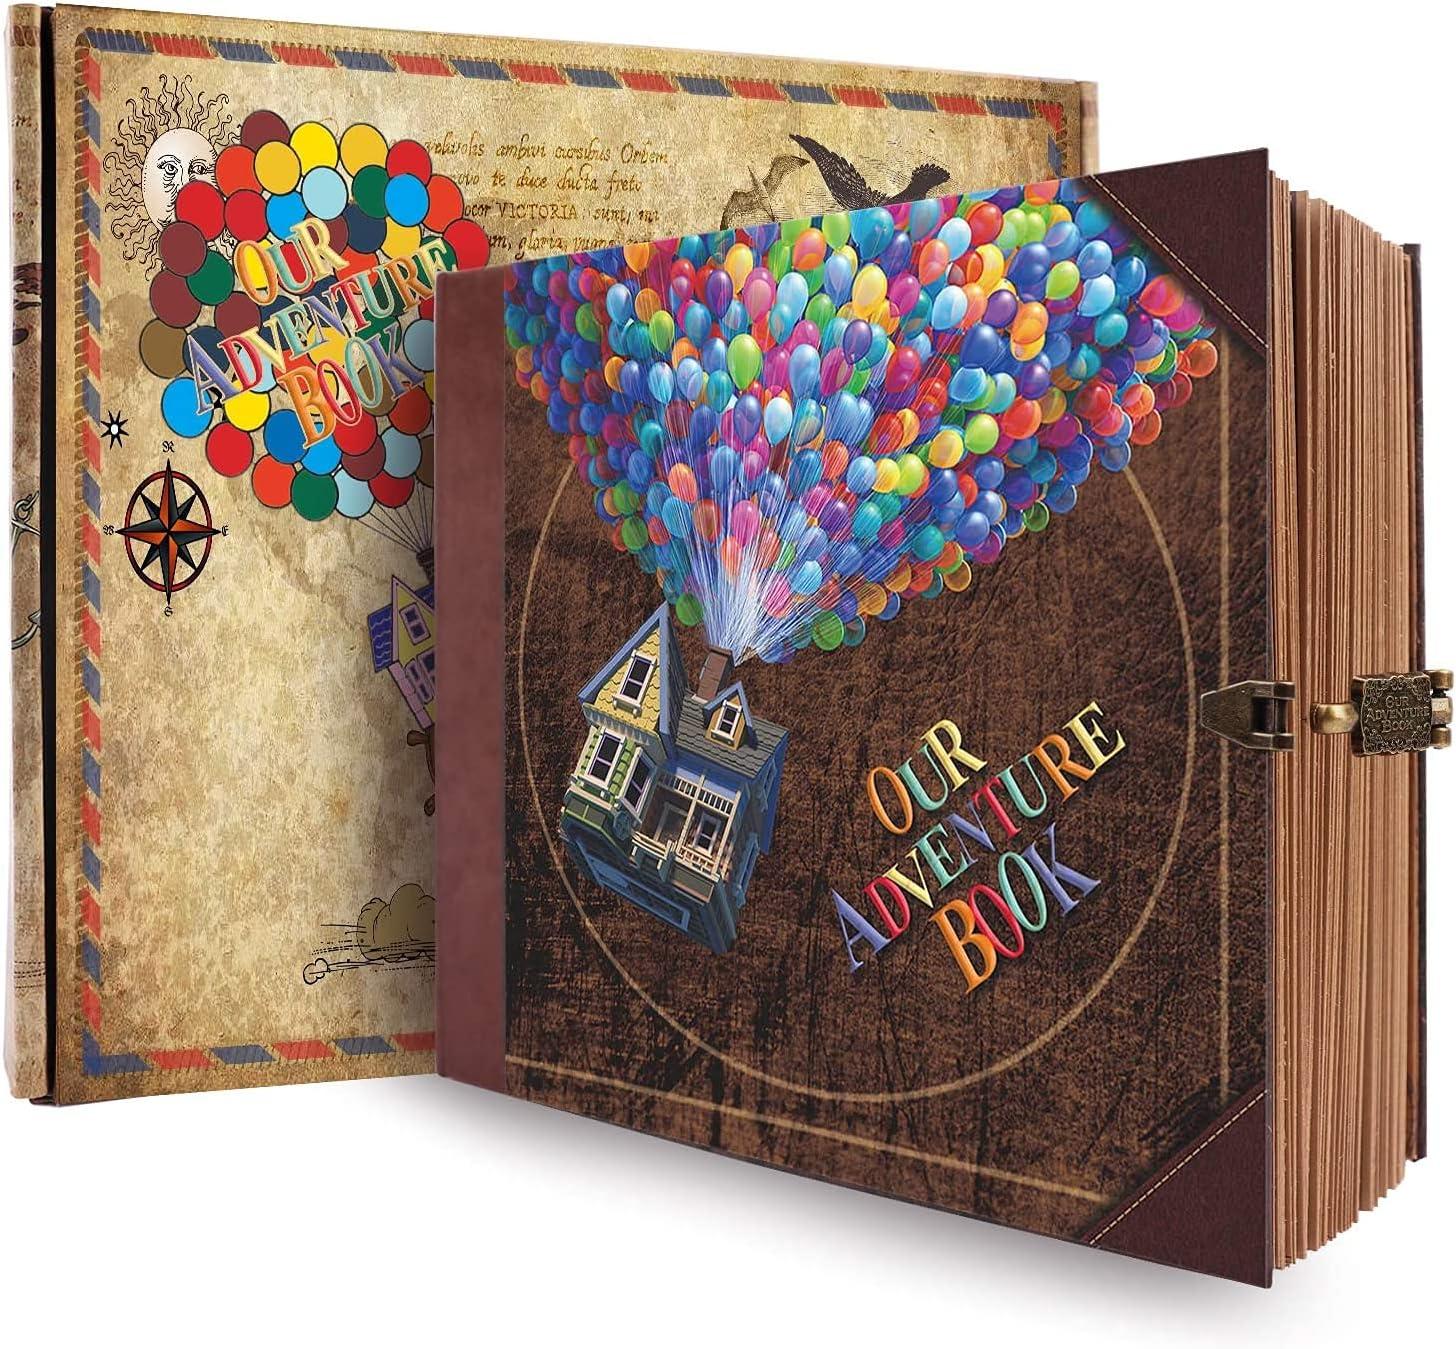 JIMBON Adventure Book Travel Diary Photo Book, Scrapbook, Retro Style Travel Souvenir, Guestbook DIY Anniversary Wedding Travel Writing Baby Friend Gift, Vintage Brown (Multicolored)